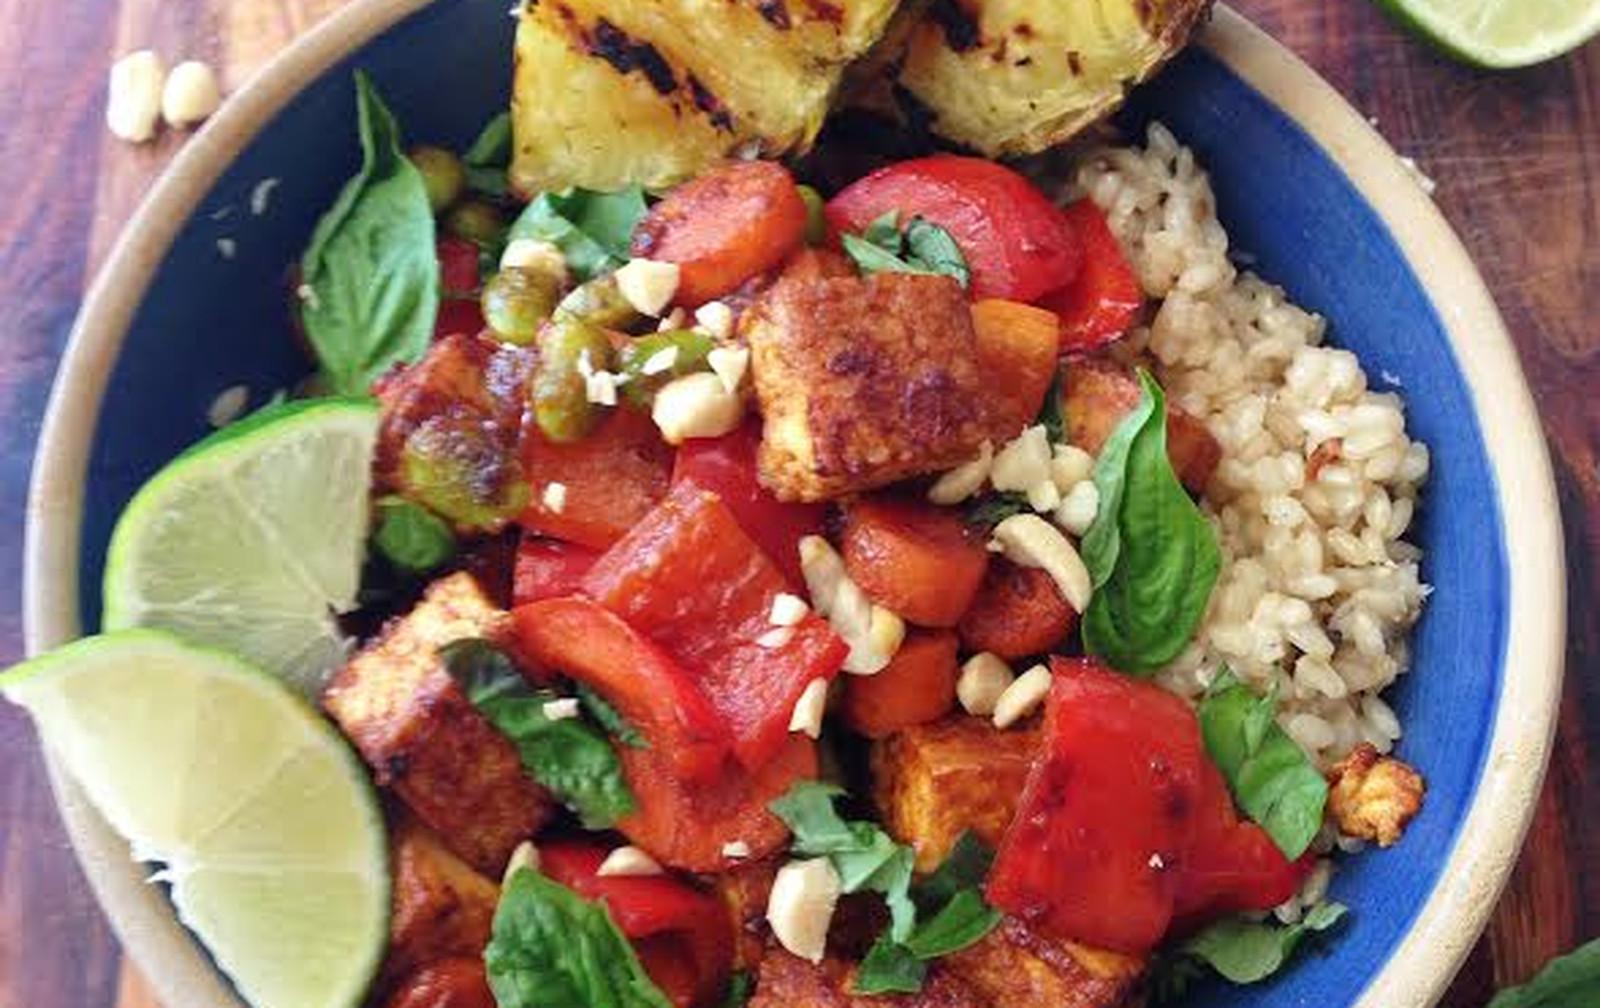 Sweet Chili Peanut Tofu, Vegetable, and Grilled Pineapple Stir-Fry [Vegan, Gluten-Free]